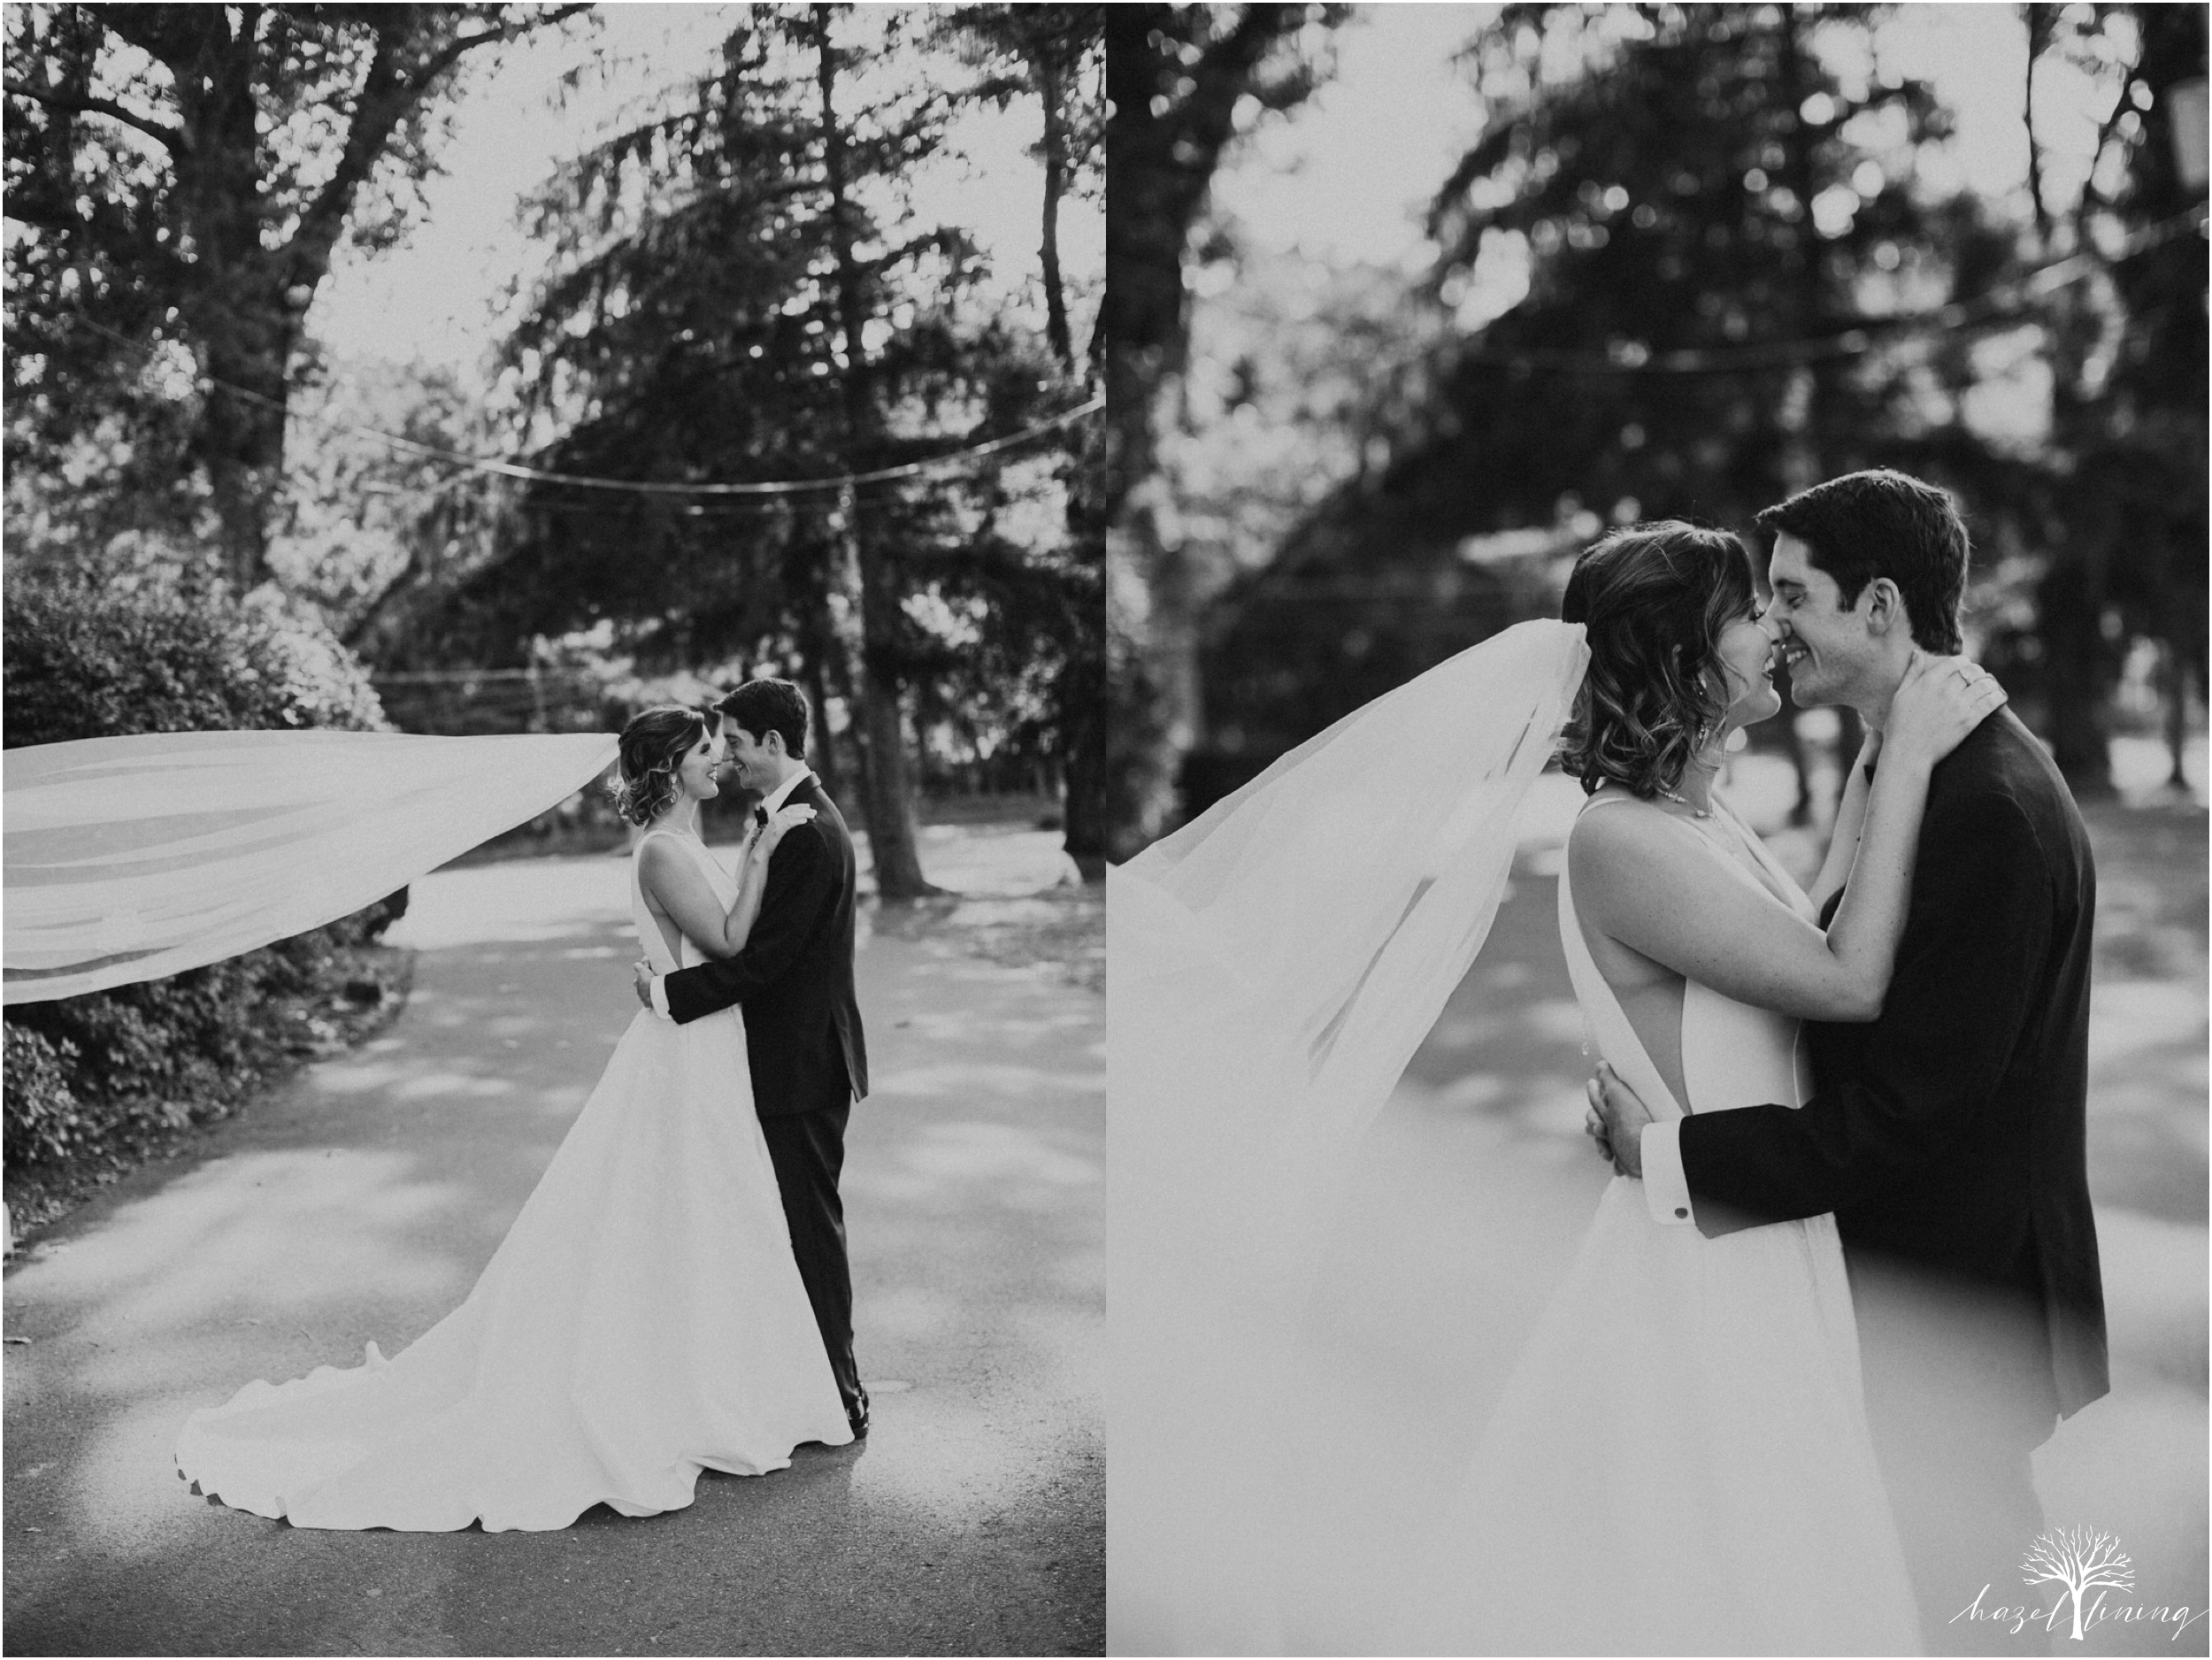 maureen-hepner-anthony-giordano-rose-bank-winery-newtow-pennsylvania-luxury-summer-wedding-hazel-lining-photography-destination-elopement-wedding-engagement-photography_0093.jpg